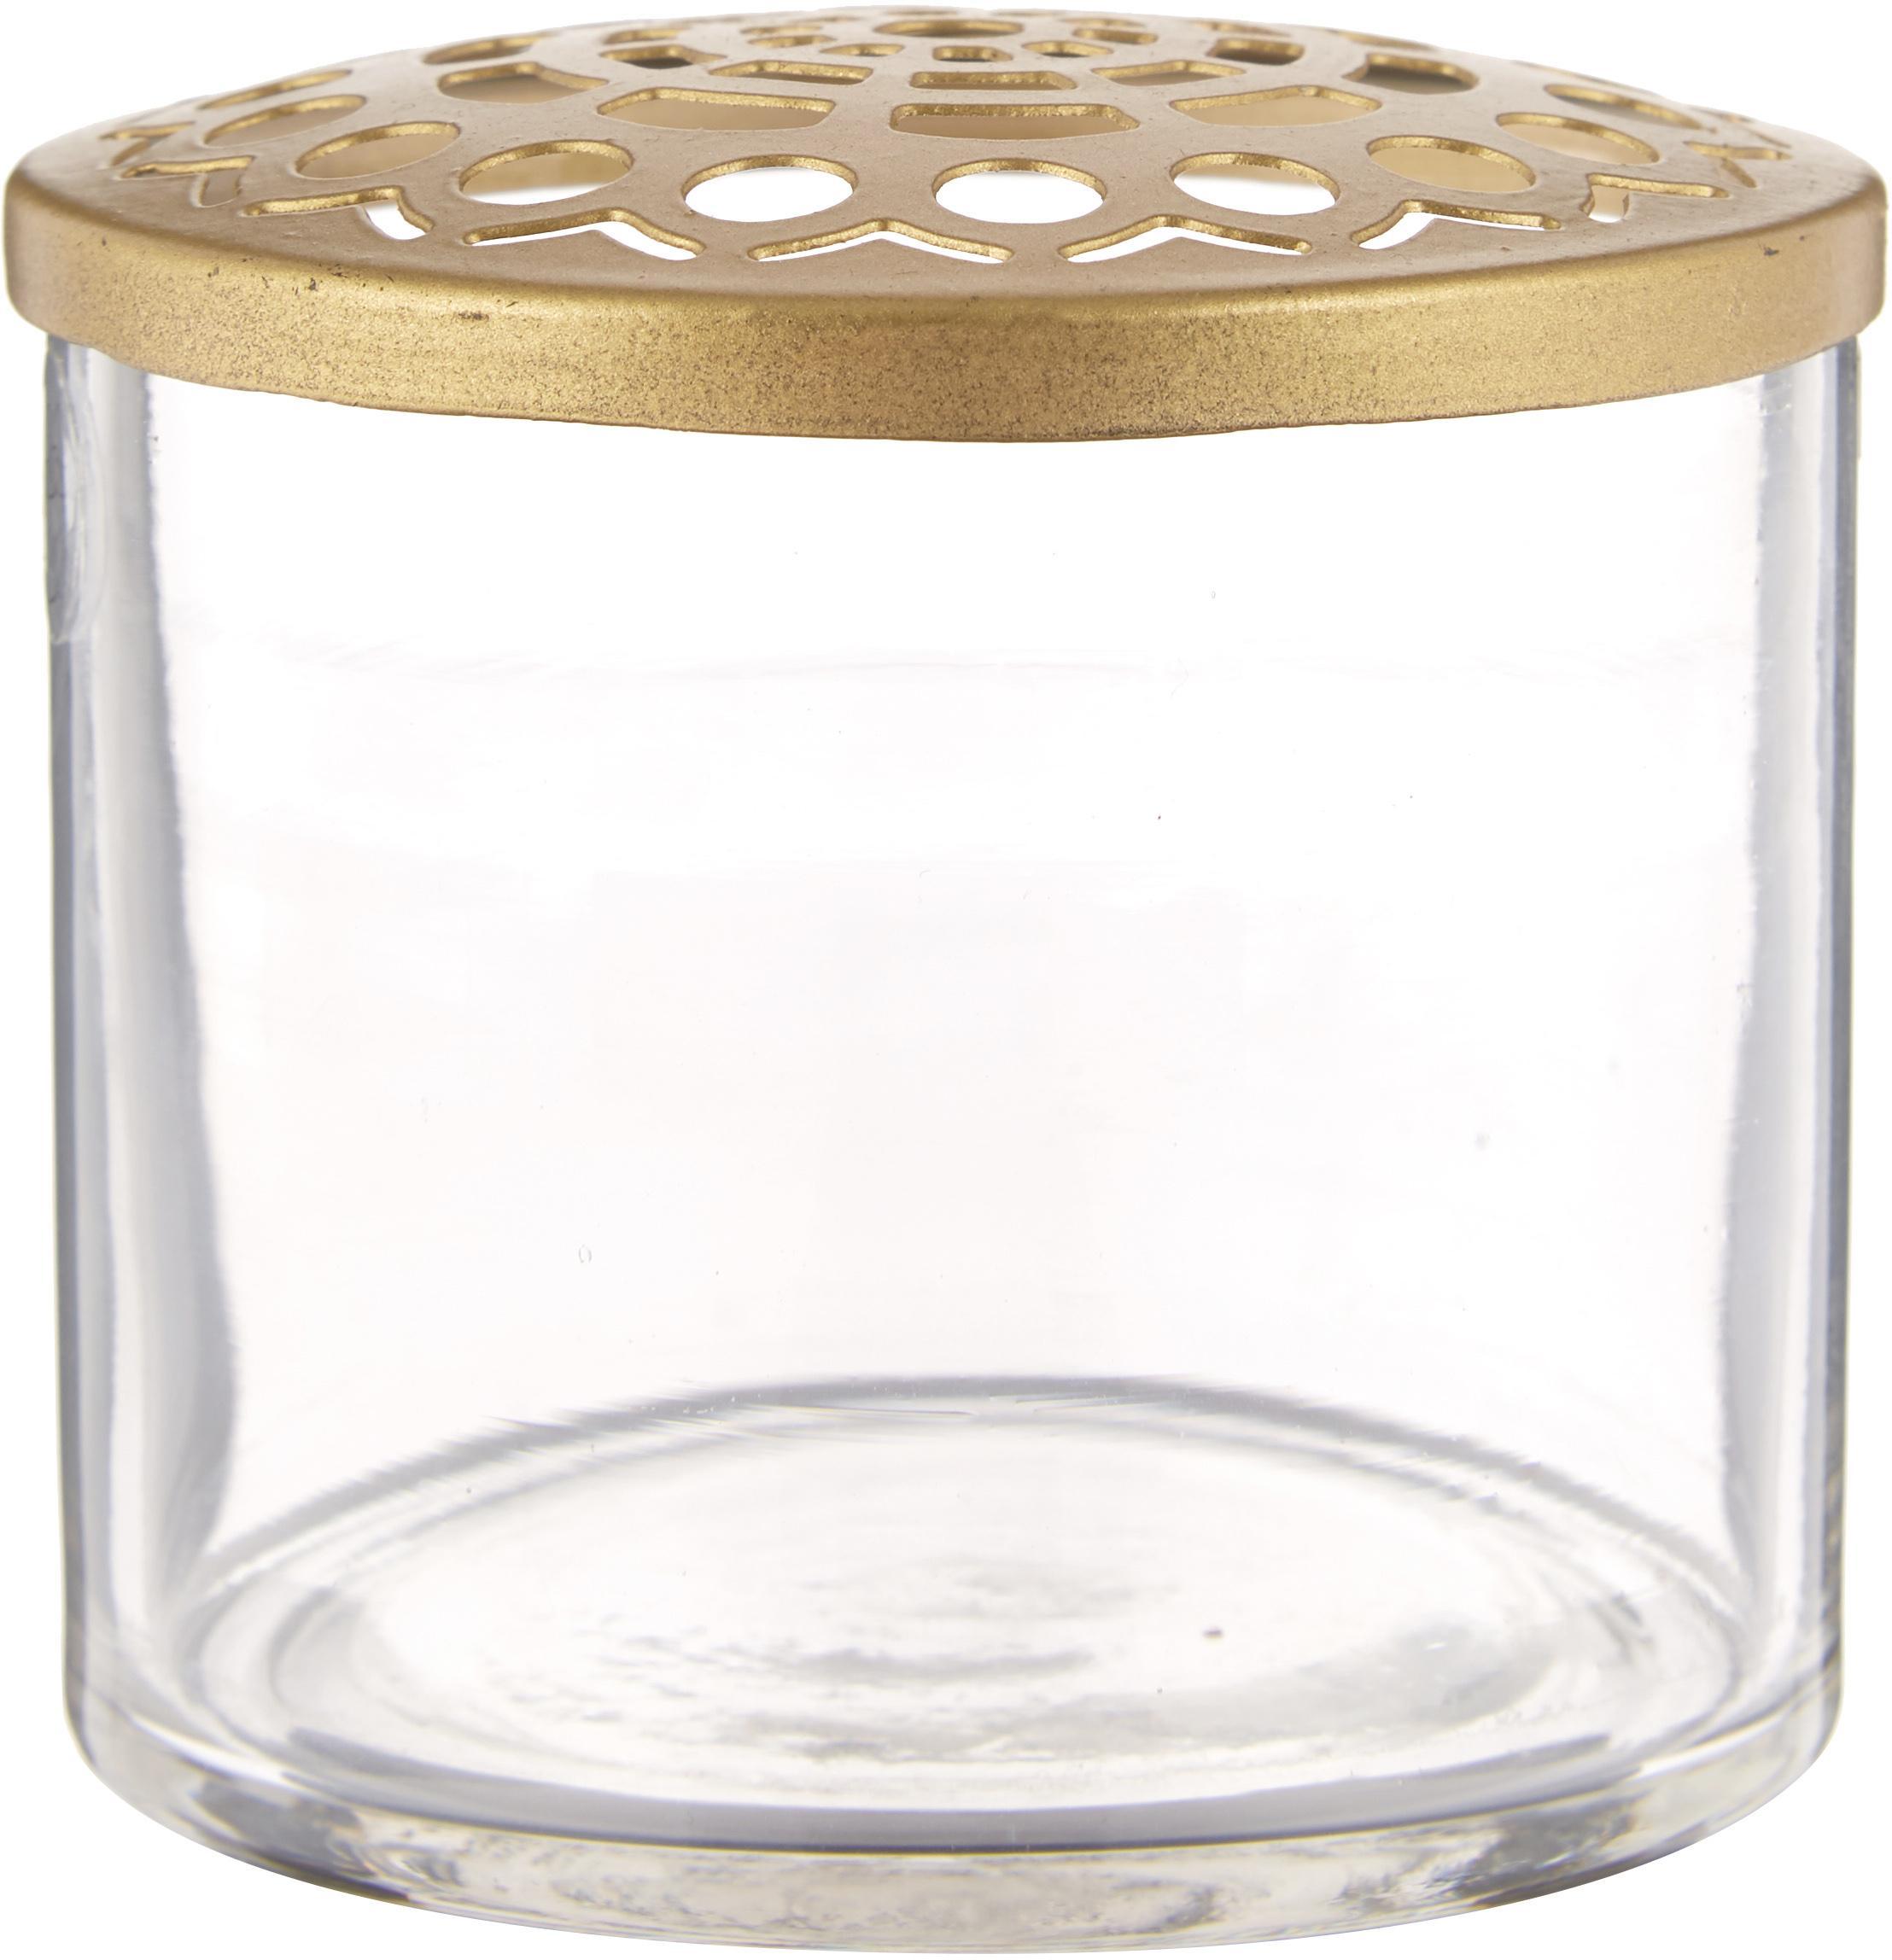 Set de jarrones pequeños Kastanje, 2pzas., Jarrón: vidrio, Jarrón: transparente Tapadera: latón, Set de diferentes tamaños